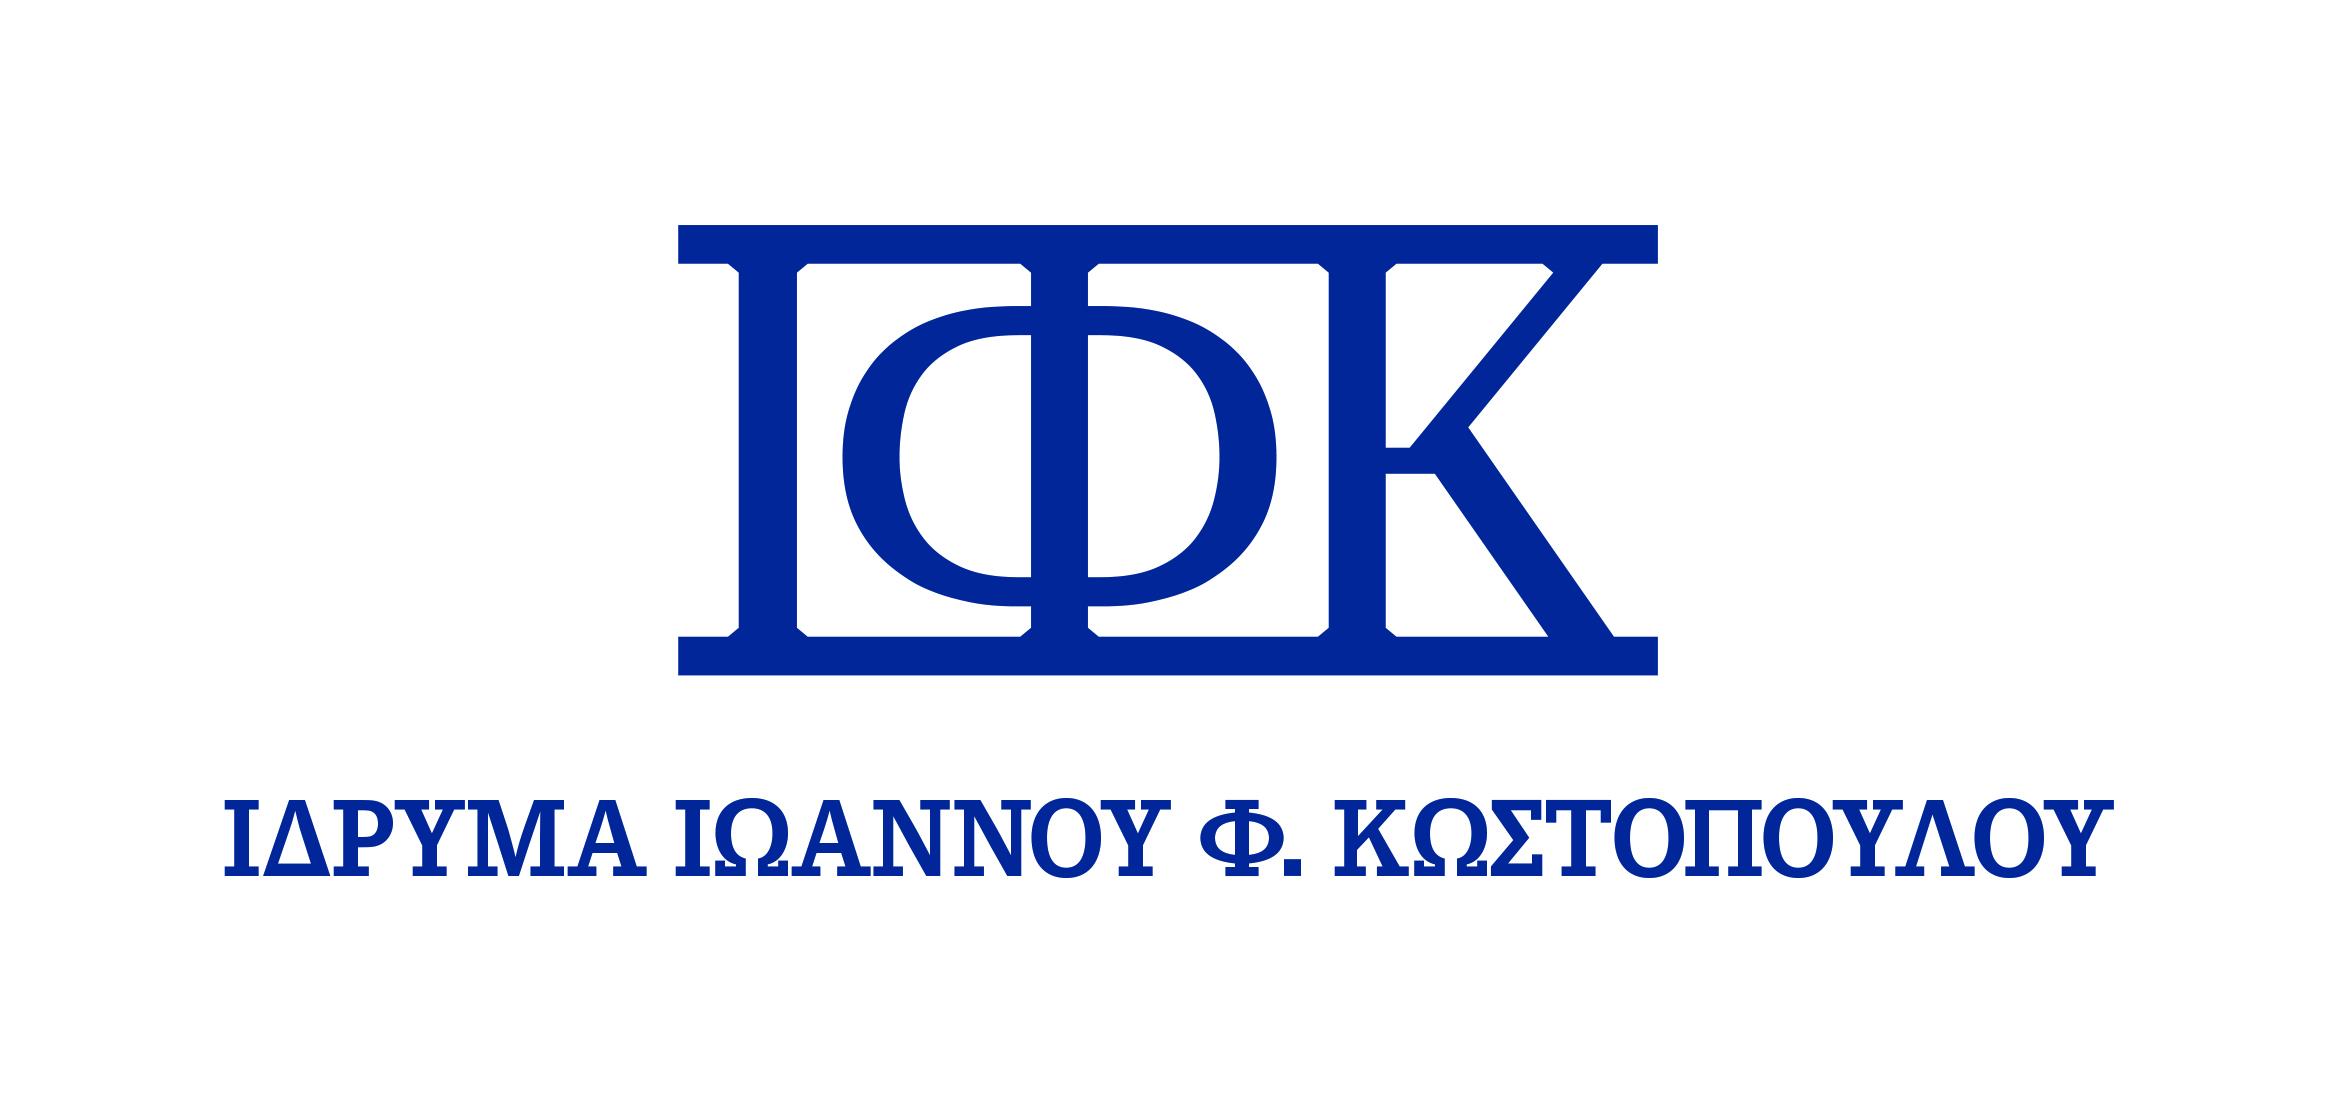 IFK-logo 2020_GR-ENG_1 arada_CMYK for JPG.ai